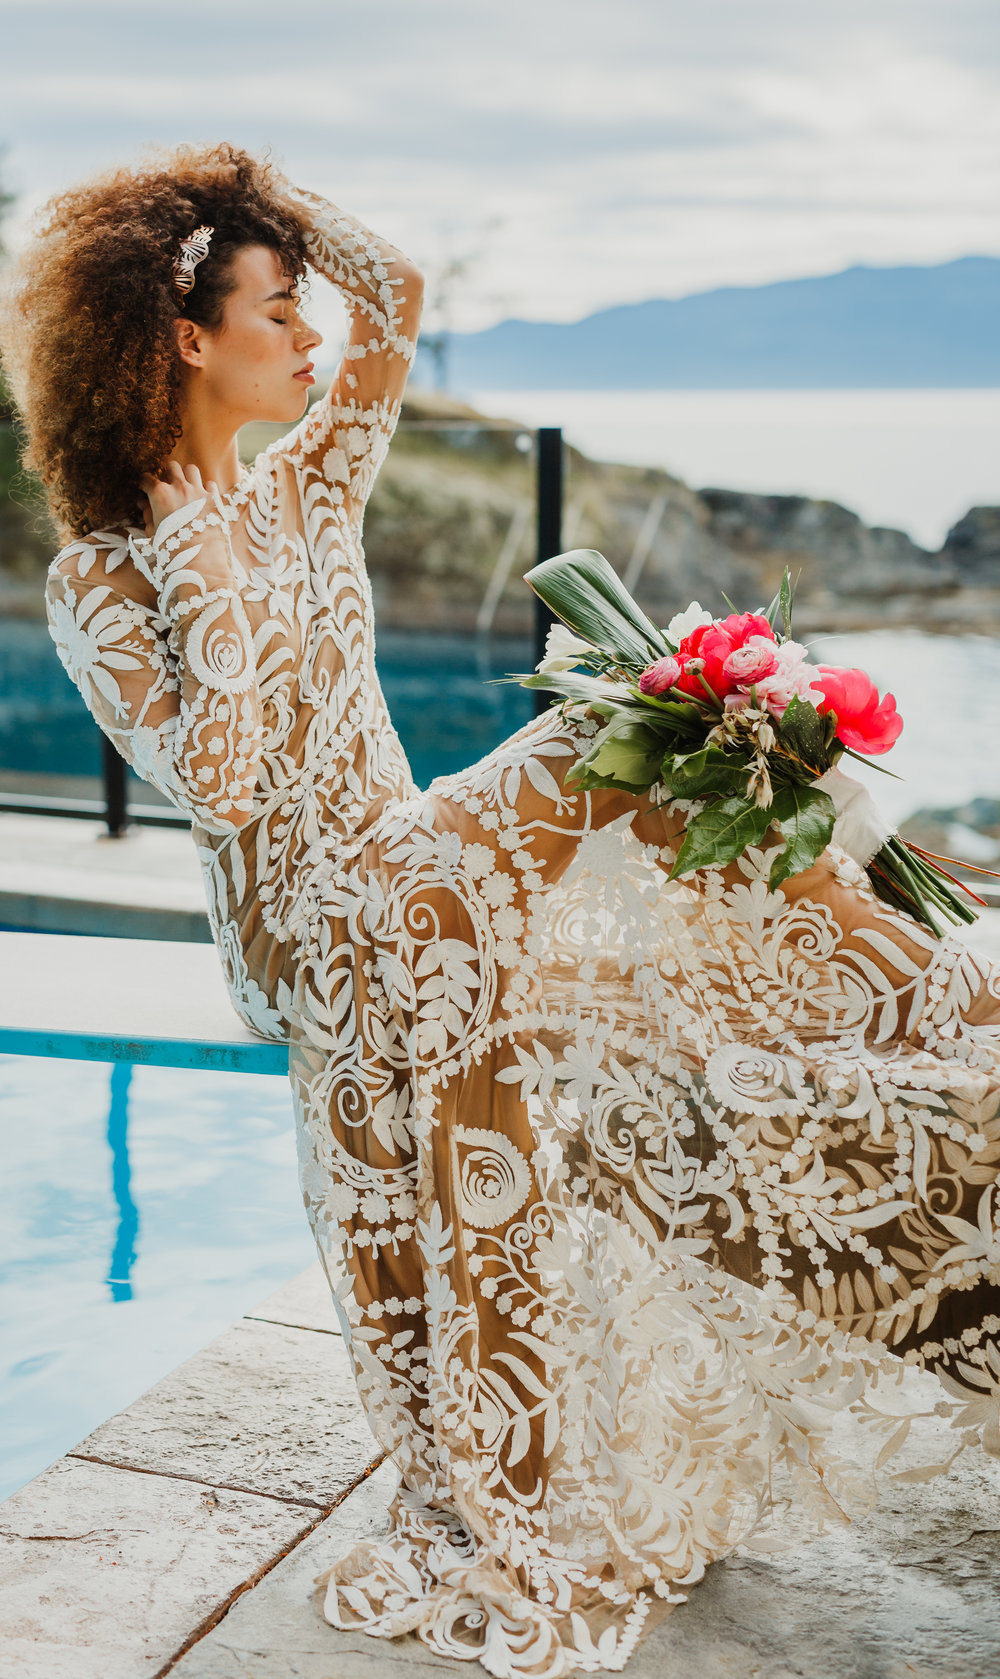 West Coast Bride - Vancouver Wedding Photographer & Videographer - Sunshine Coast Wedding Photos - Sunshine Coast Wedding Photographer - Jennifer Picard Photography - IMG_6598.jpg